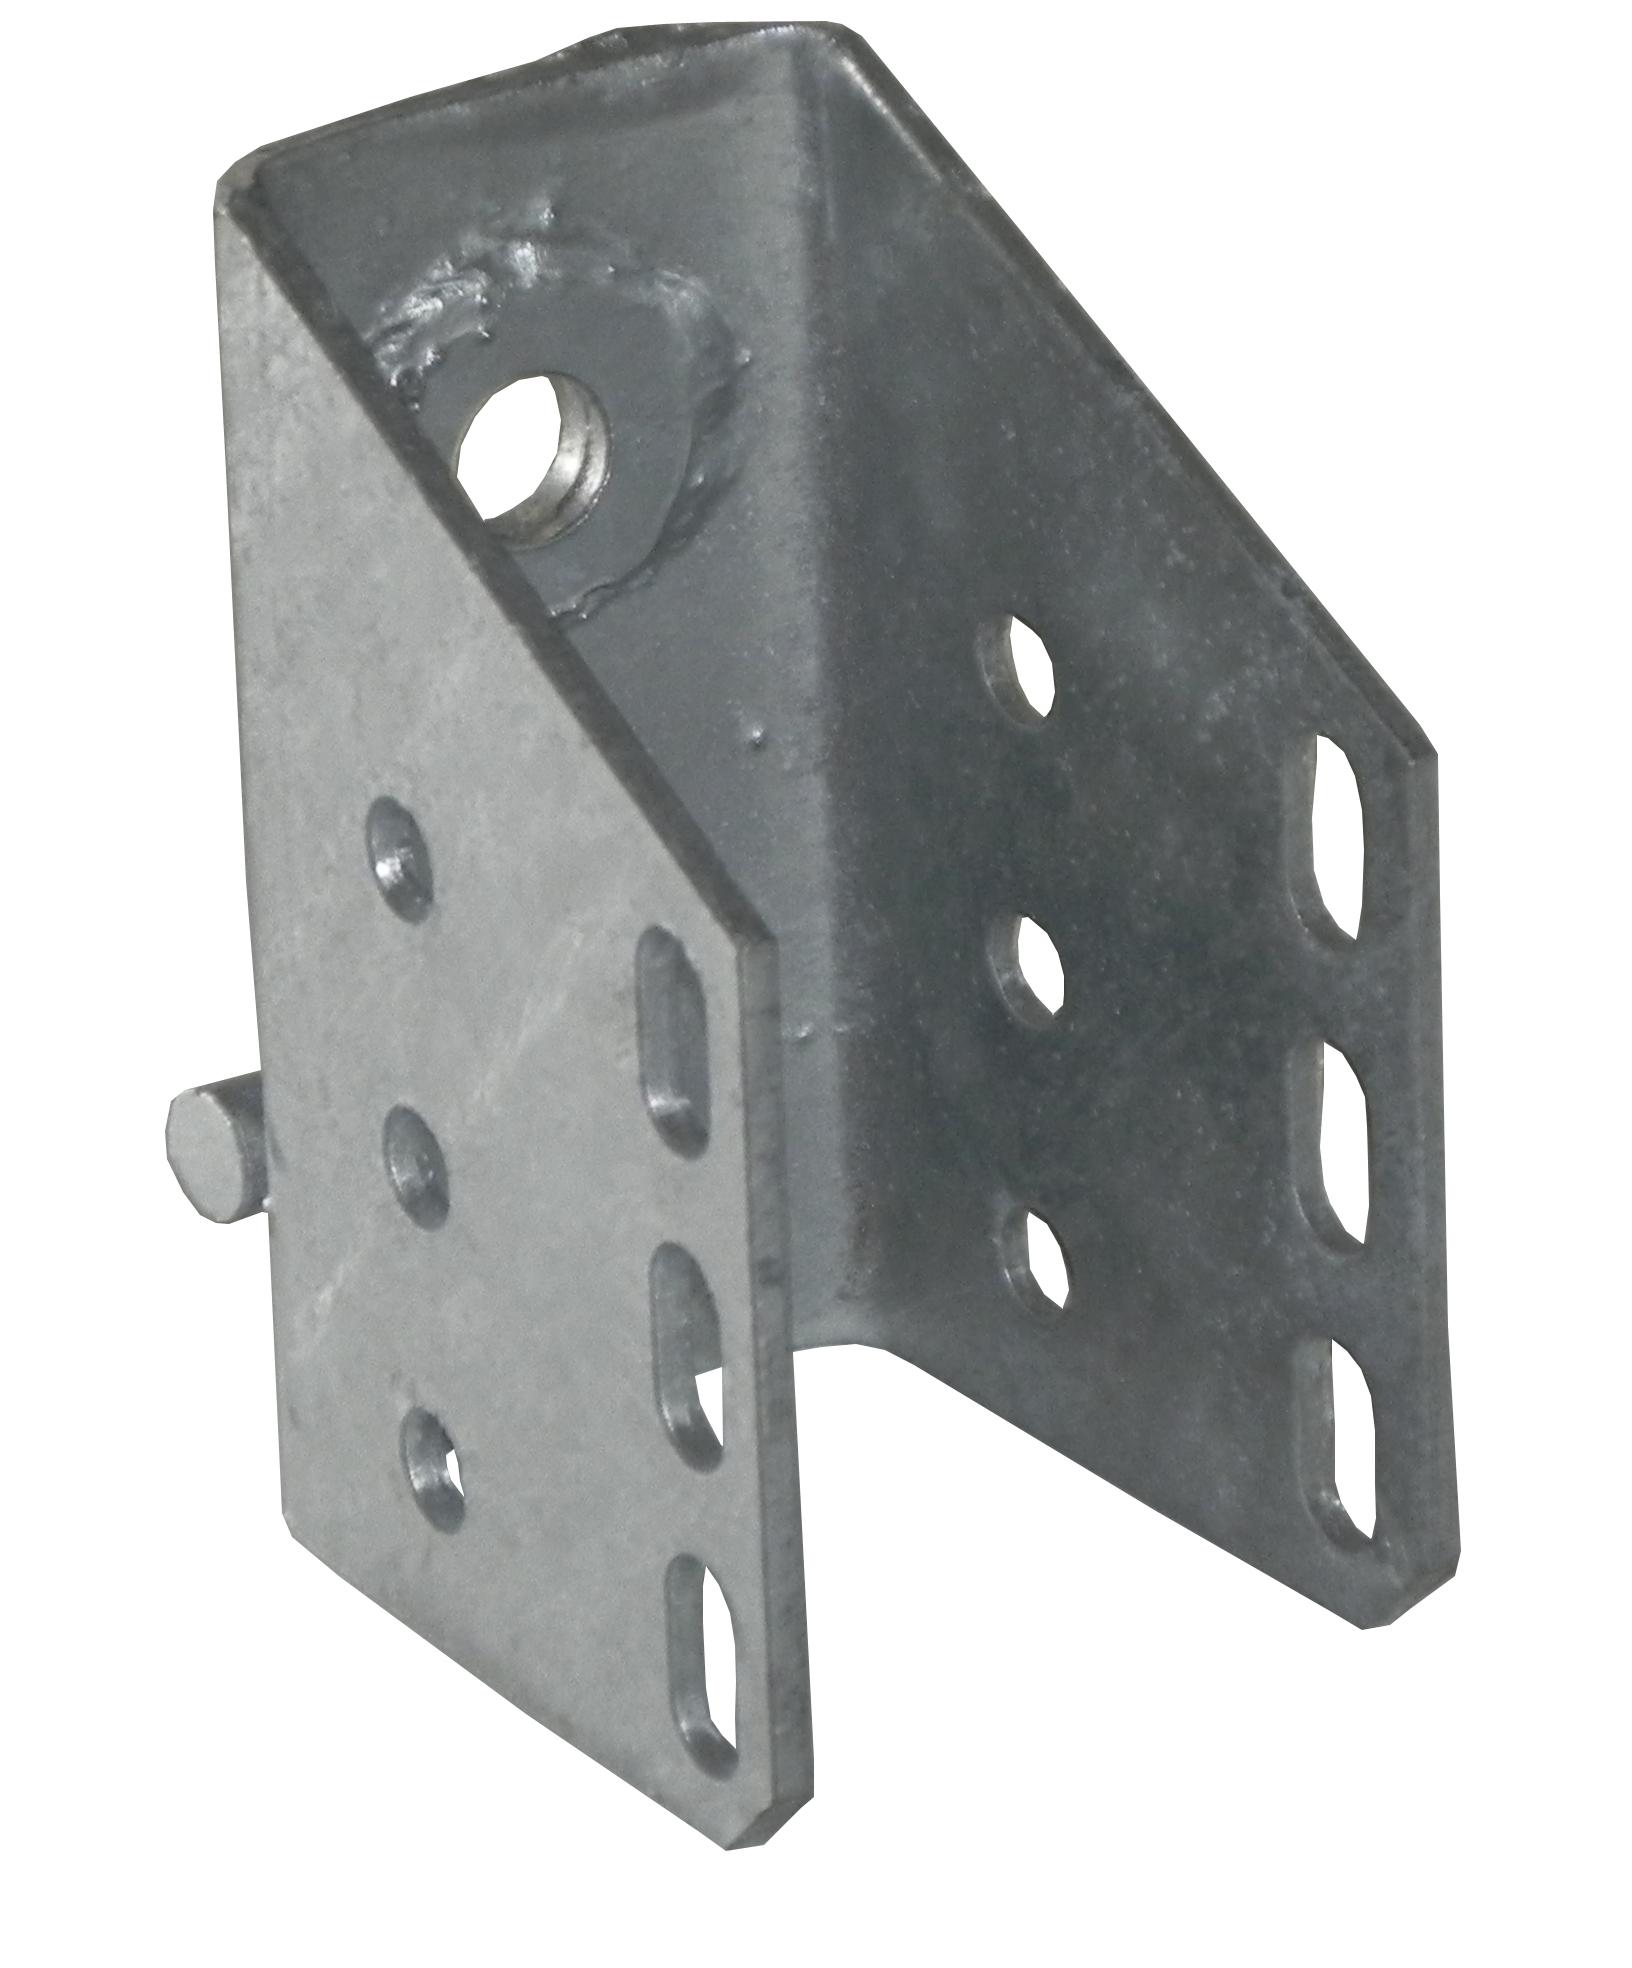 Crossbar hanger bracket quot frame load rite trailers